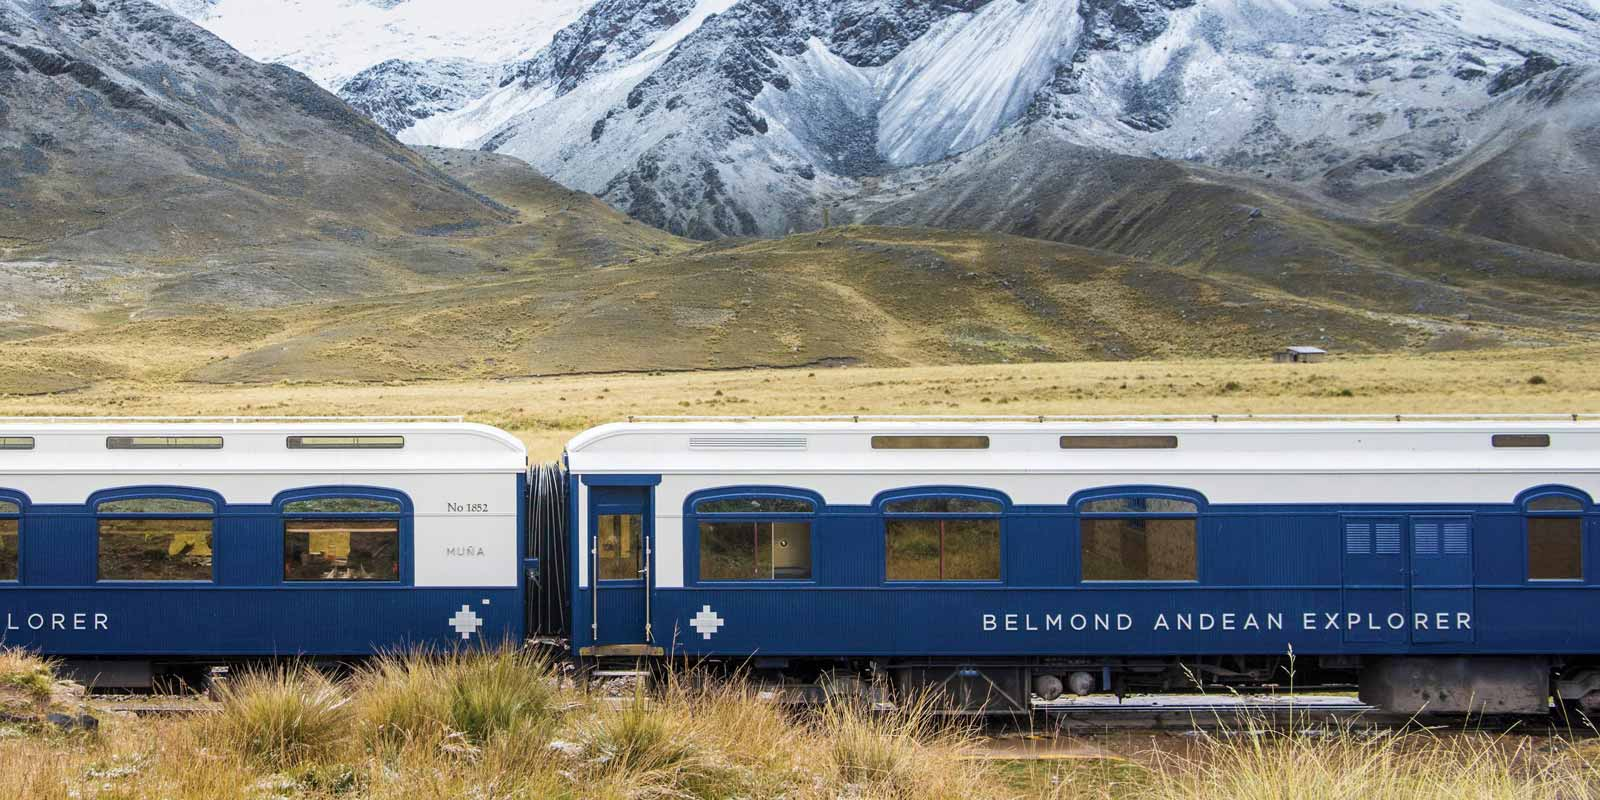 Belmond Andean Explorer Scenery